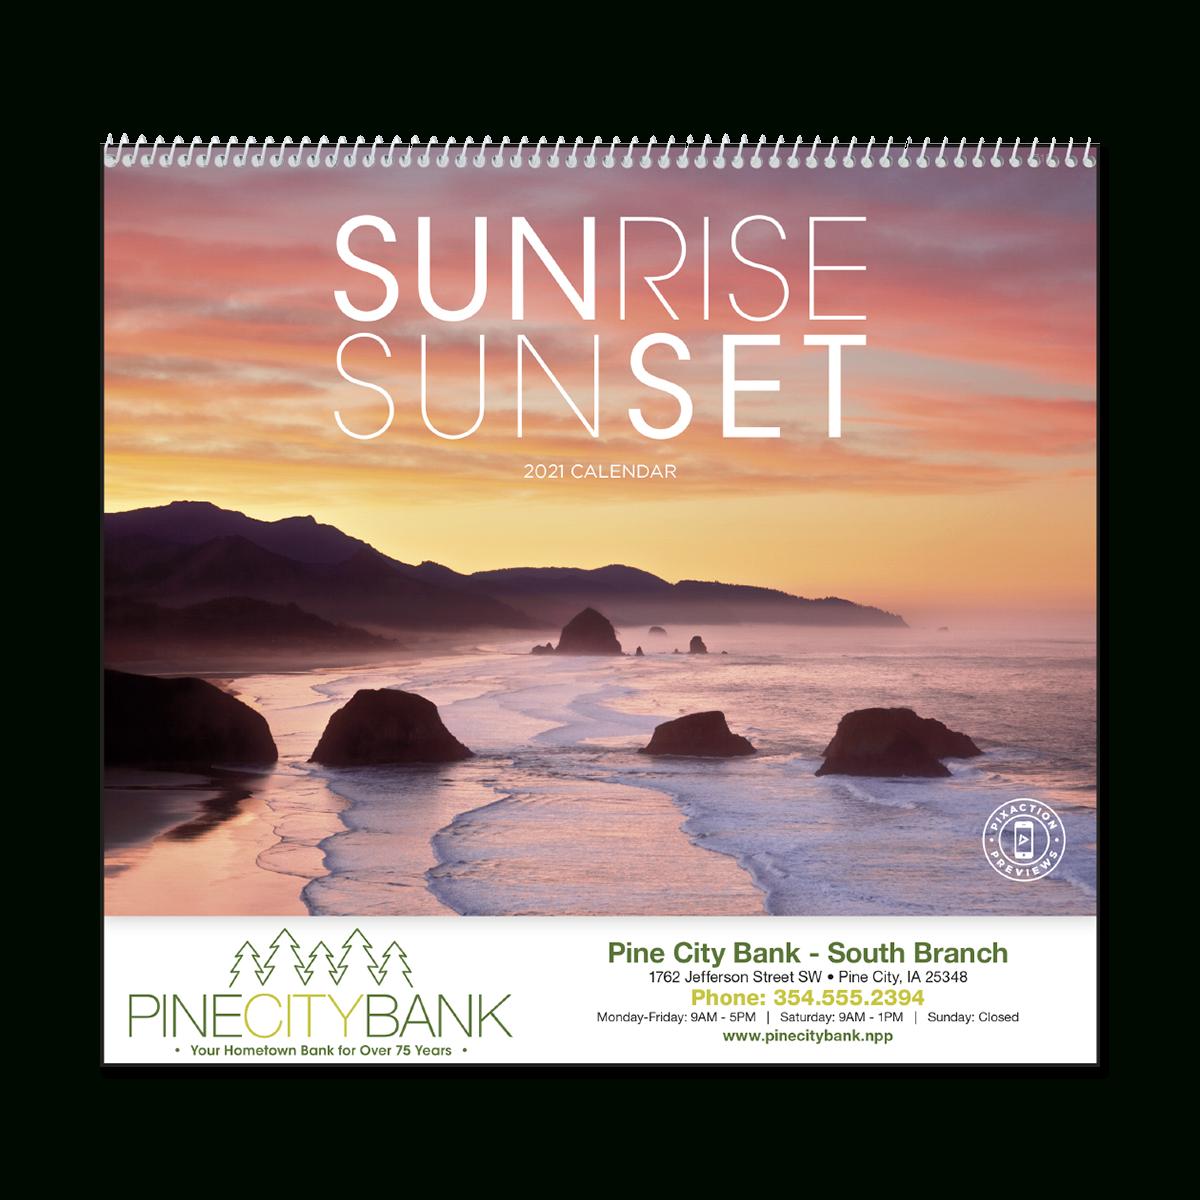 Sunrise Sunset Wall Calendar Throughout Sunrise And Sunset Calendar 2021